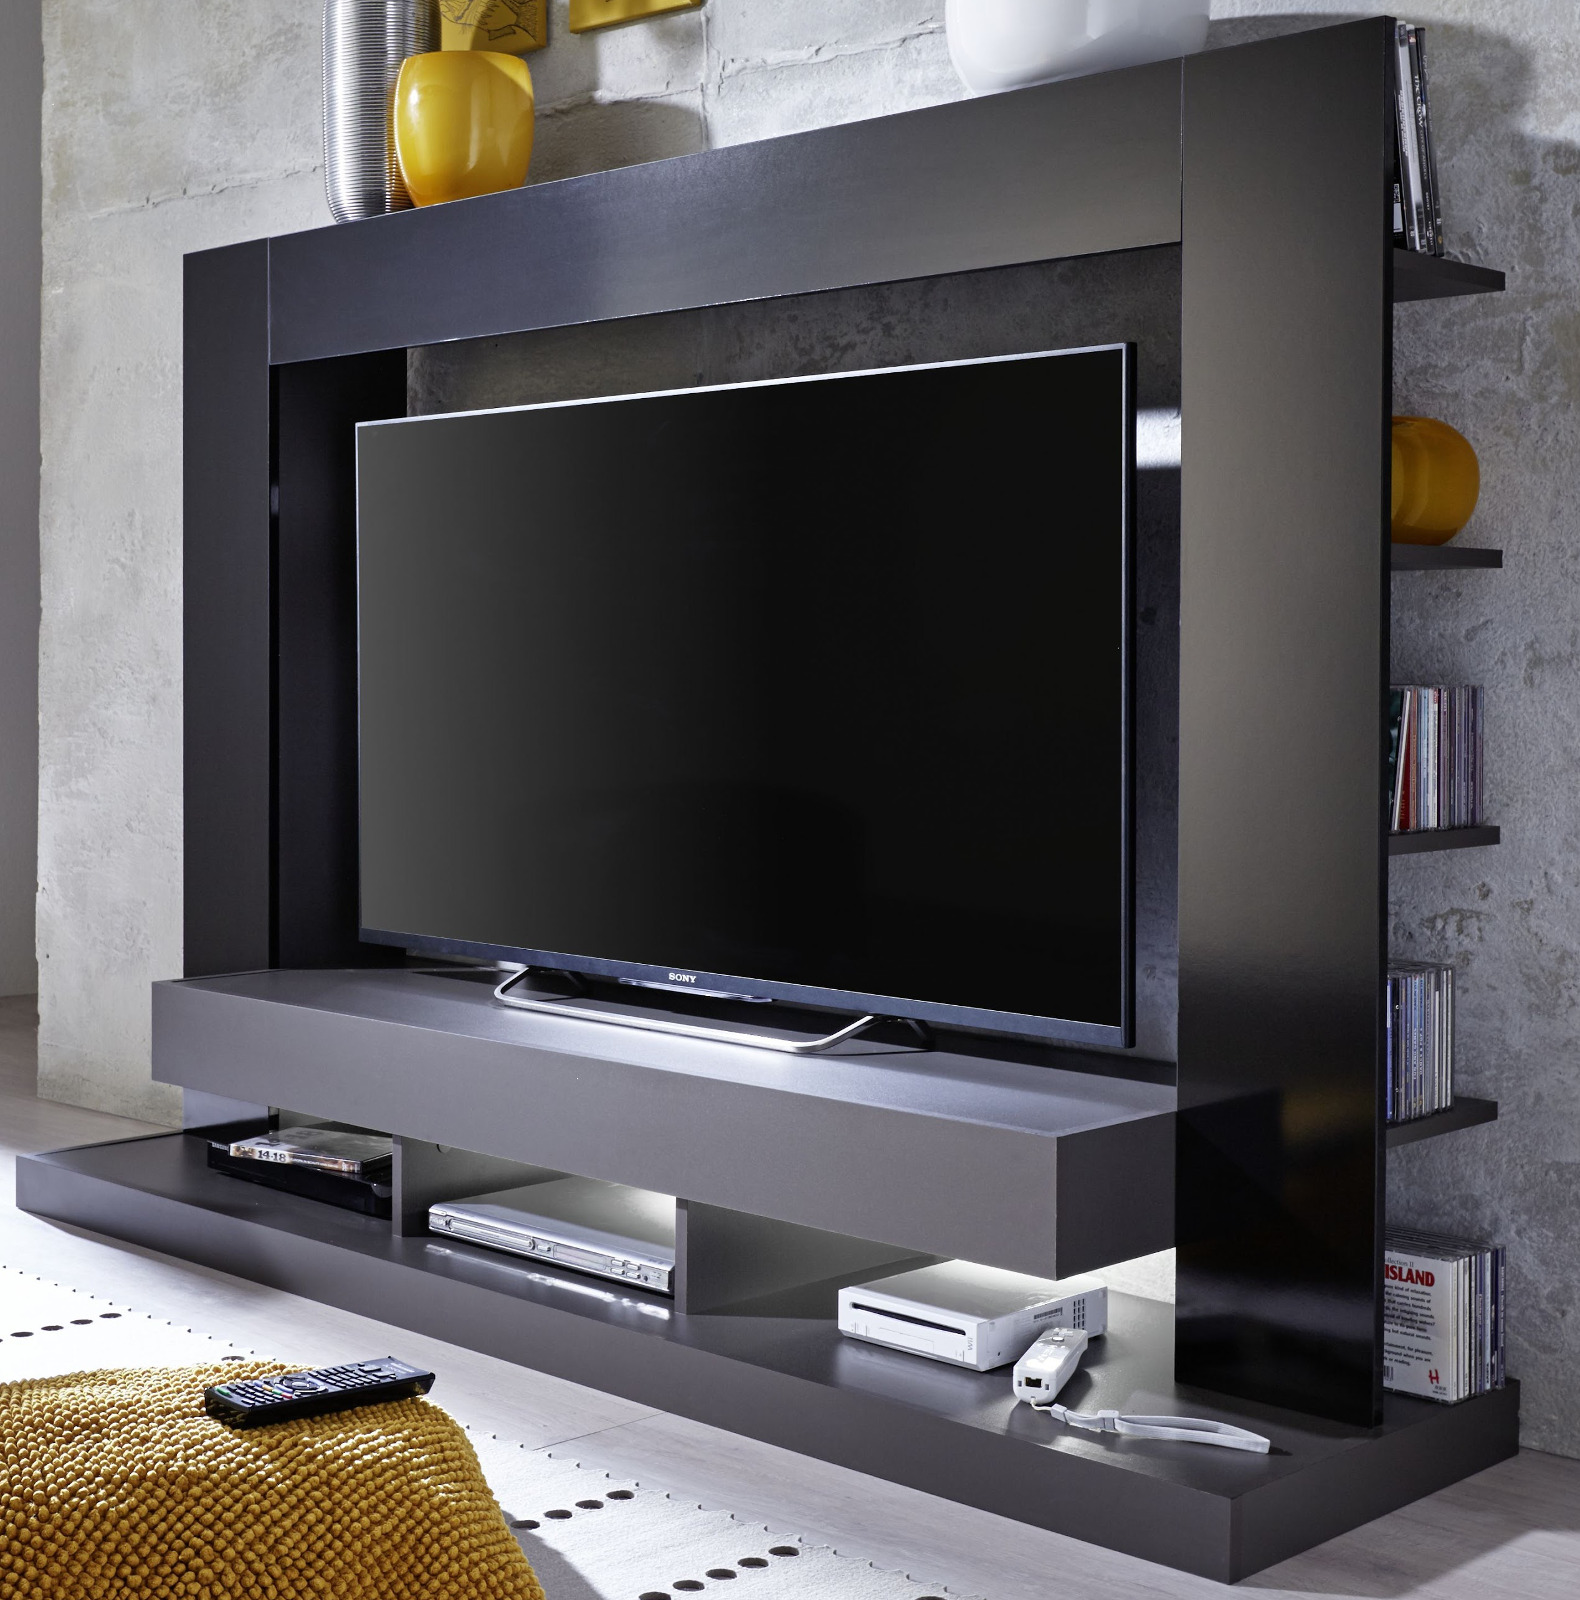 Tv schrank schwarz  Mediawand Cyneplex schwarz grau glänzend